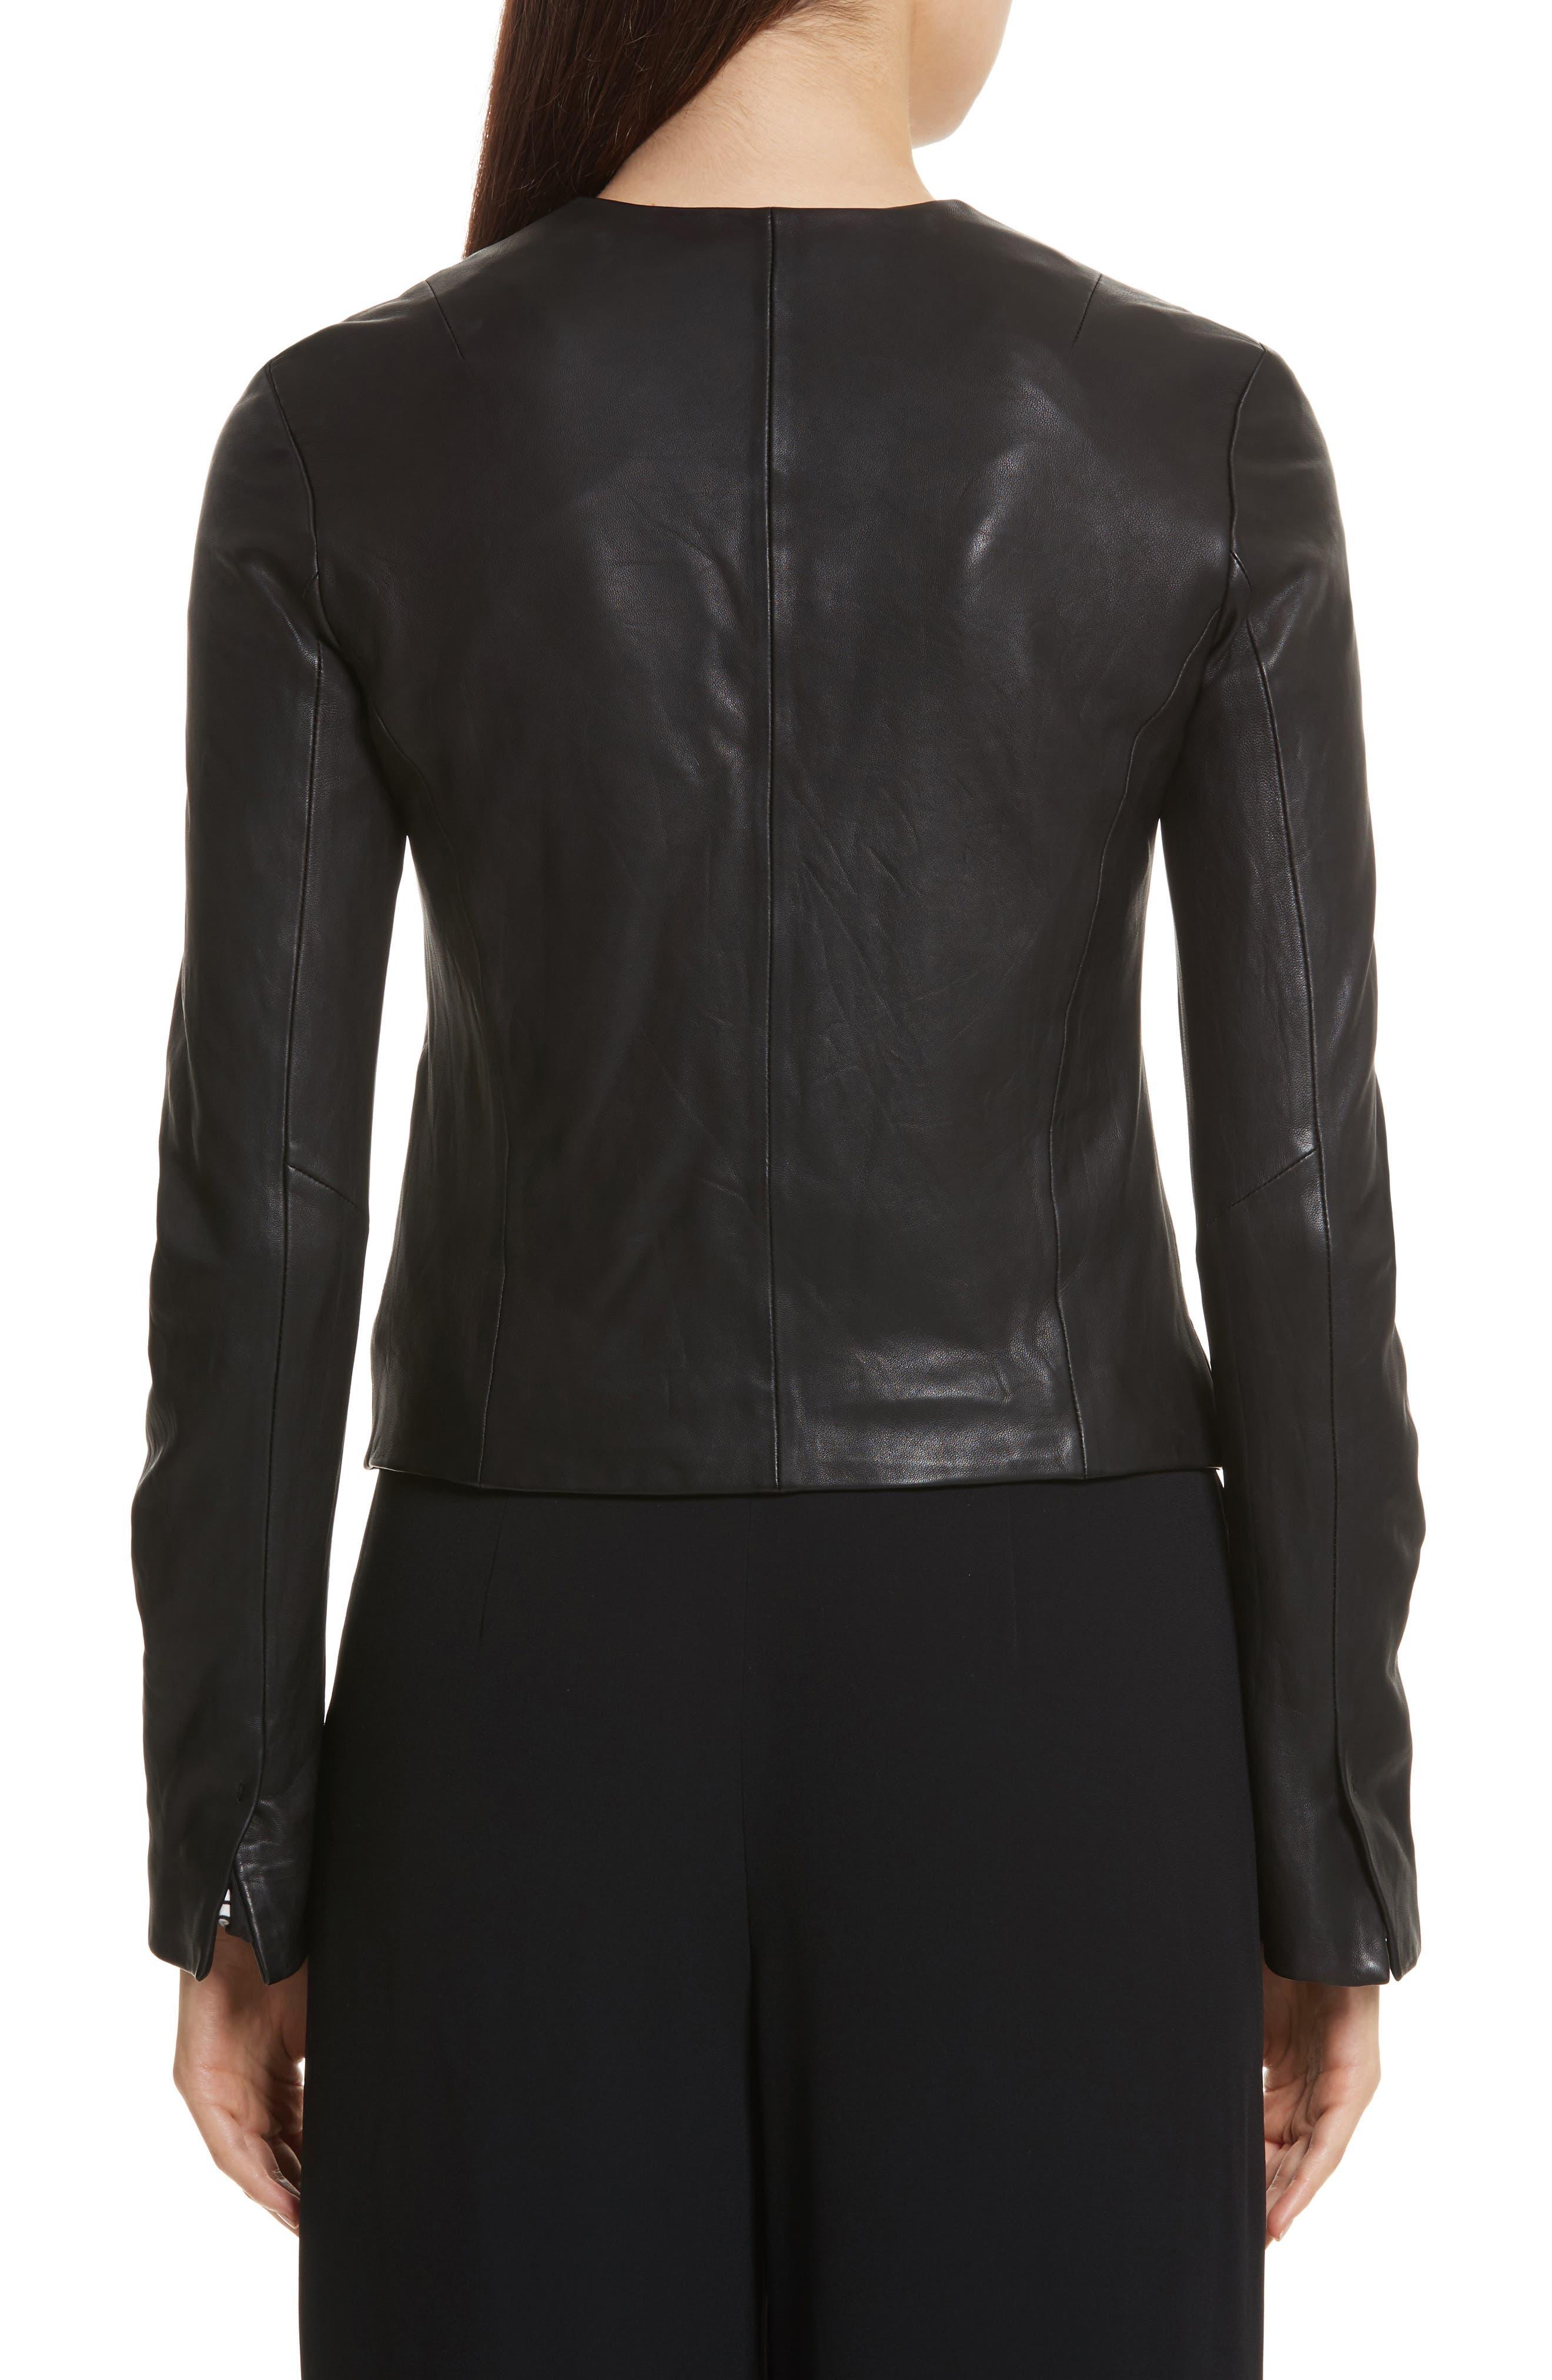 Cross Front Leather Jacket,                             Alternate thumbnail 2, color,                             Black